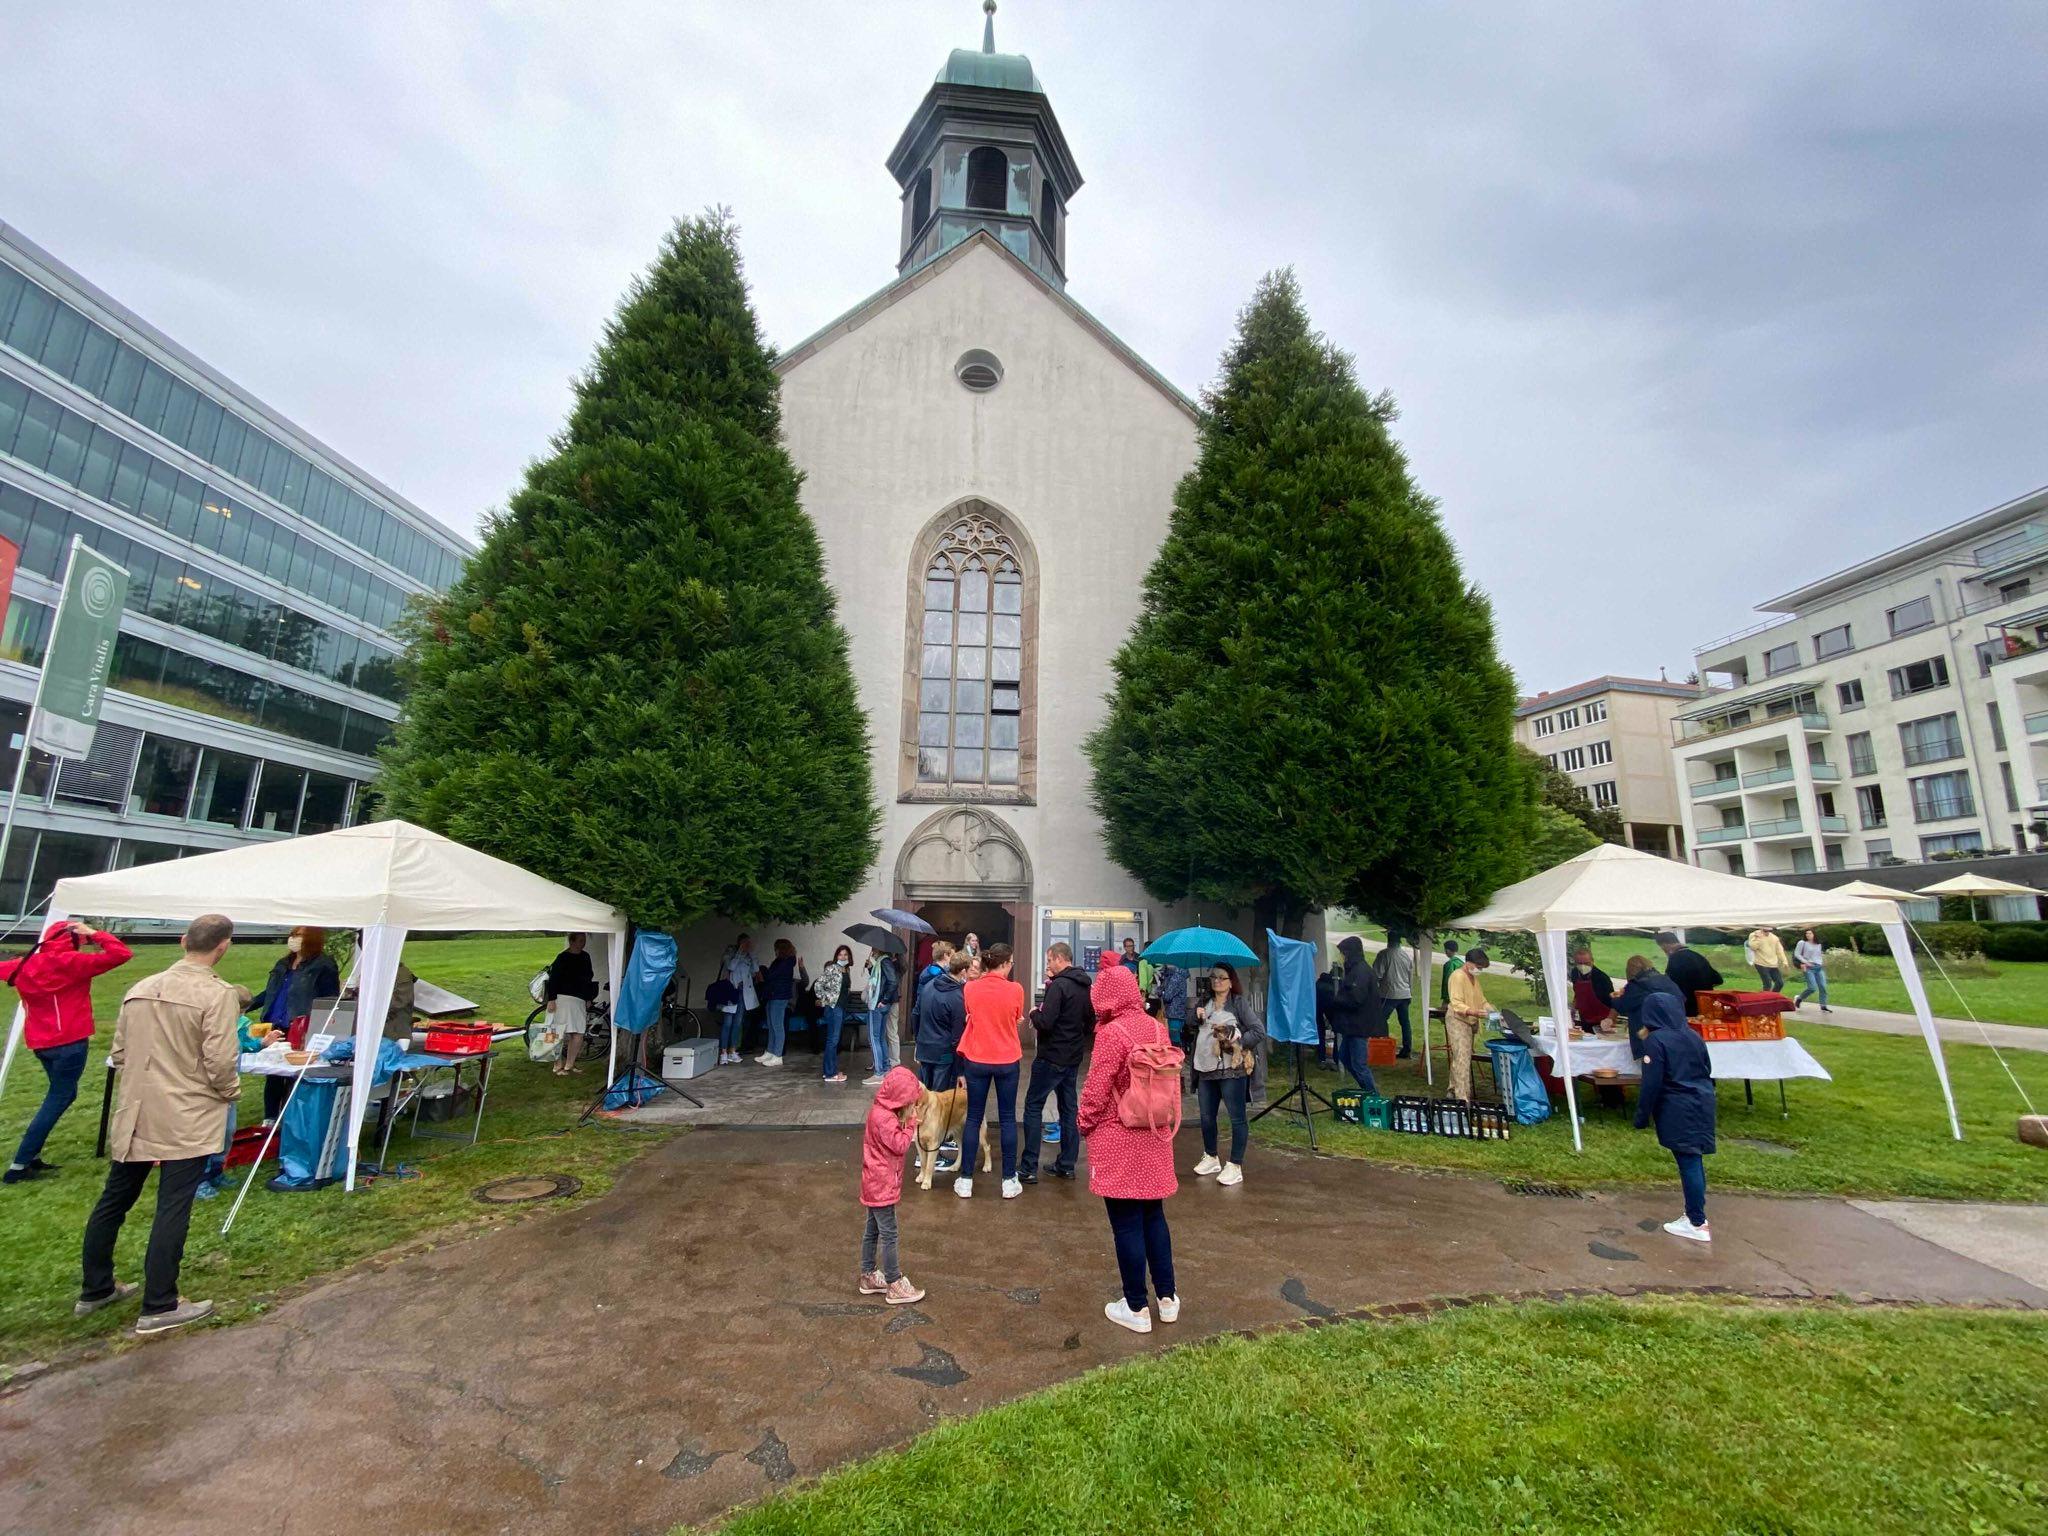 Spitalkirchenfest 2021